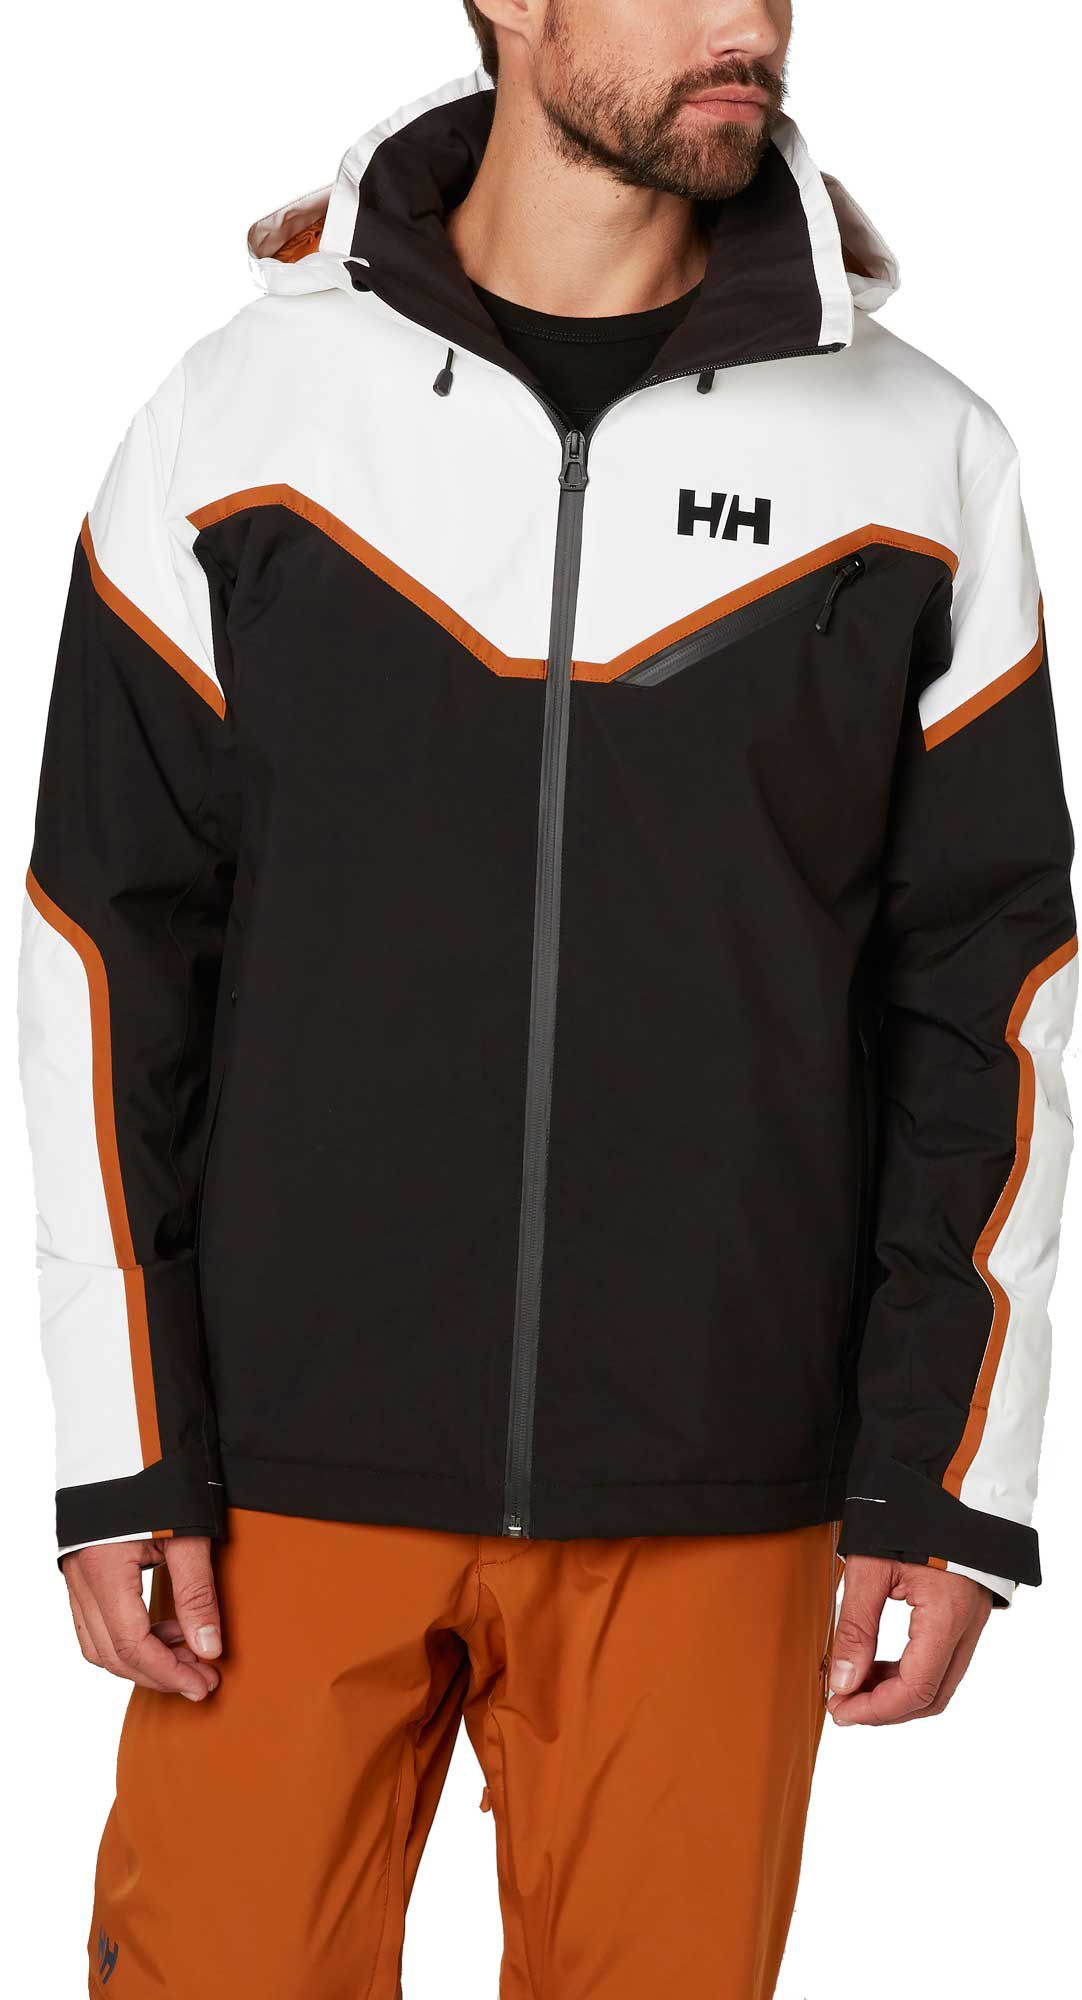 Helly hansen mens nine helly tech jacket